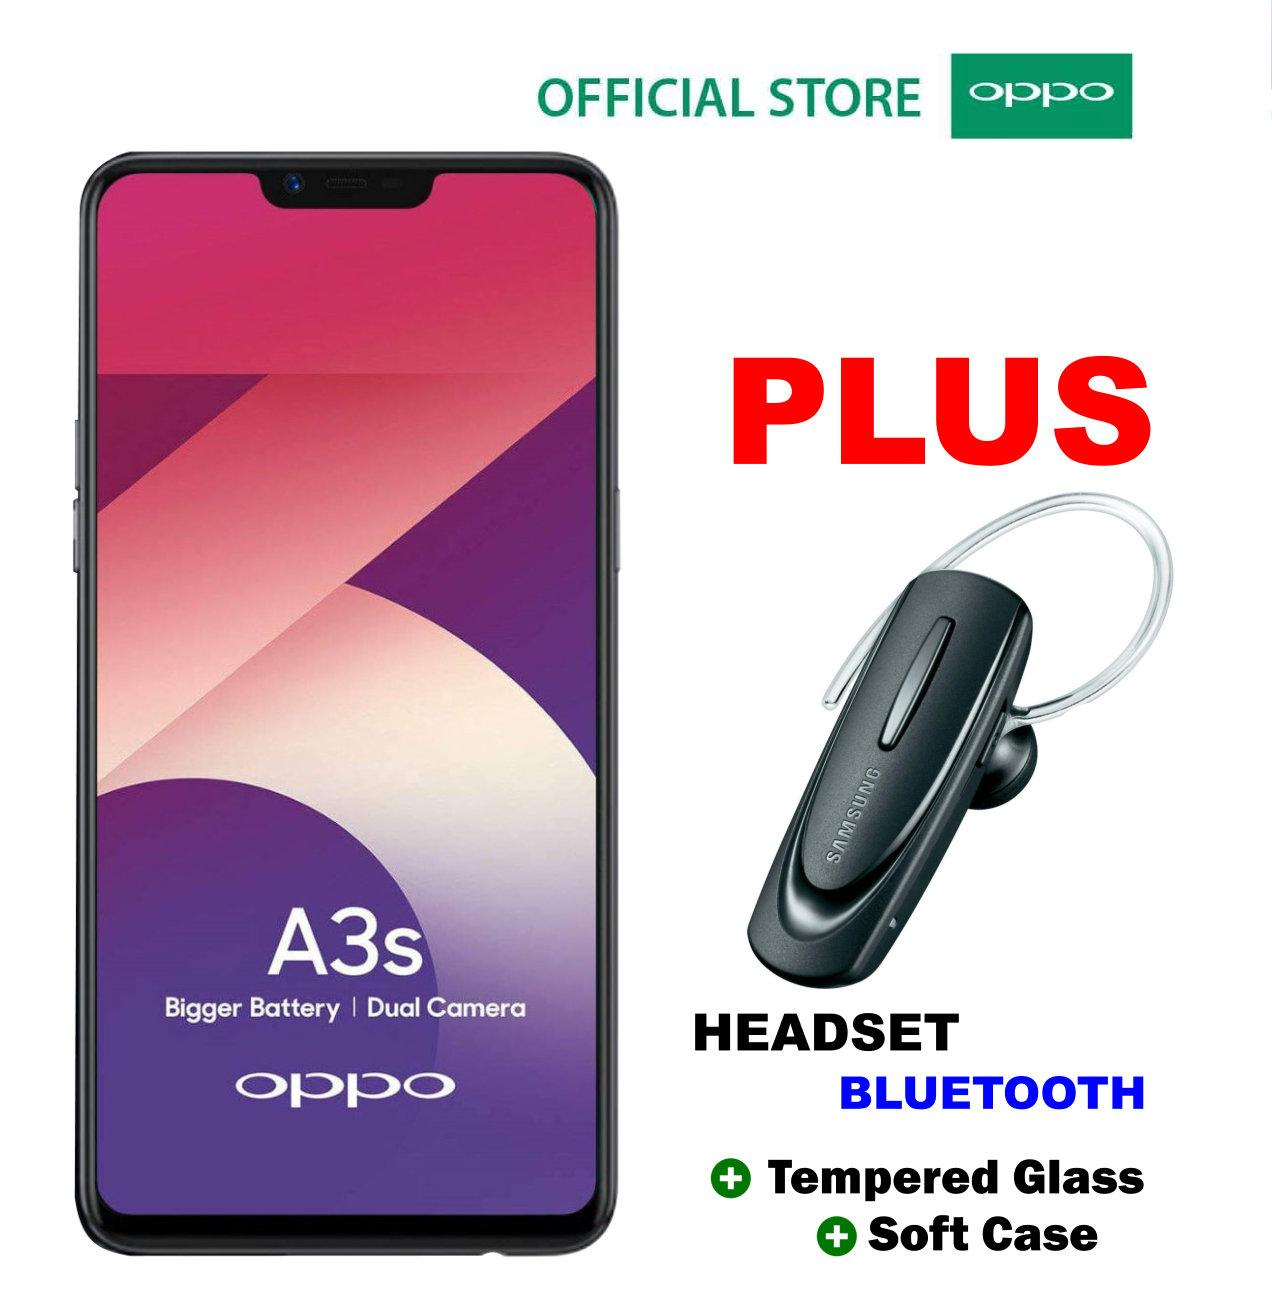 OPPO A3S 2/16GB - Plus Perlengkapan Sholat Wanita